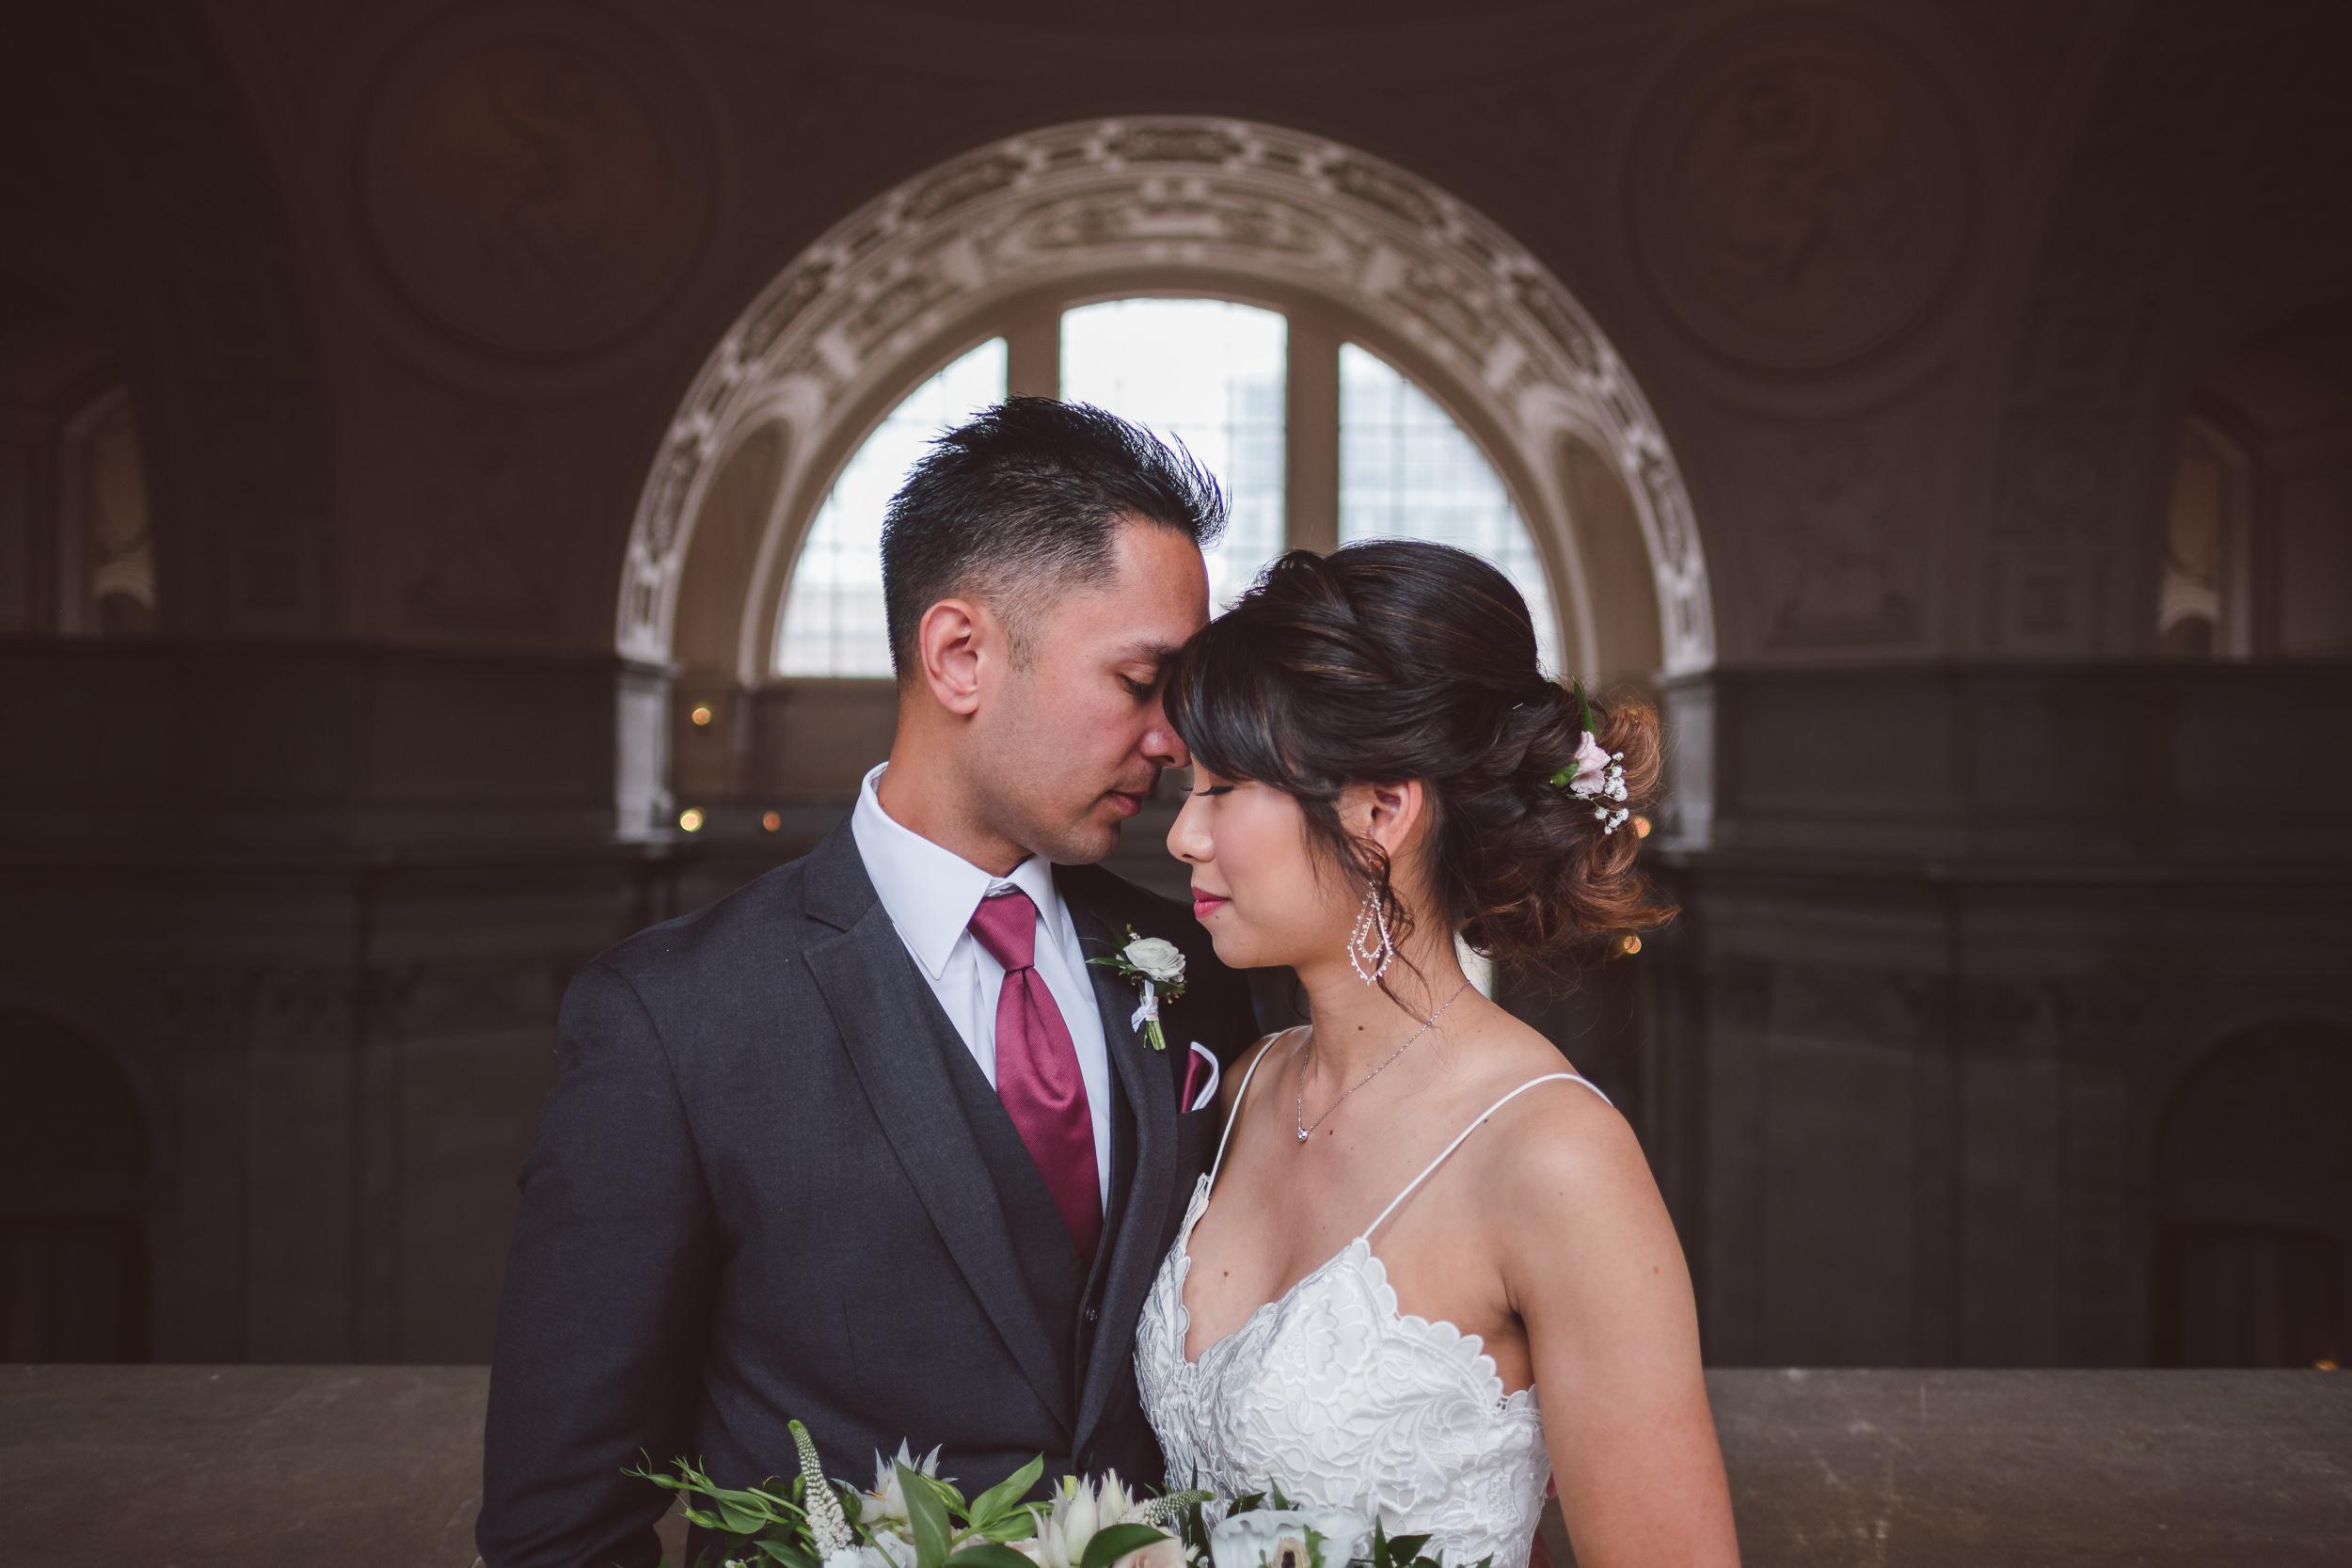 San-Francisco-City-Hall-Wedding-Photography-058.jpg